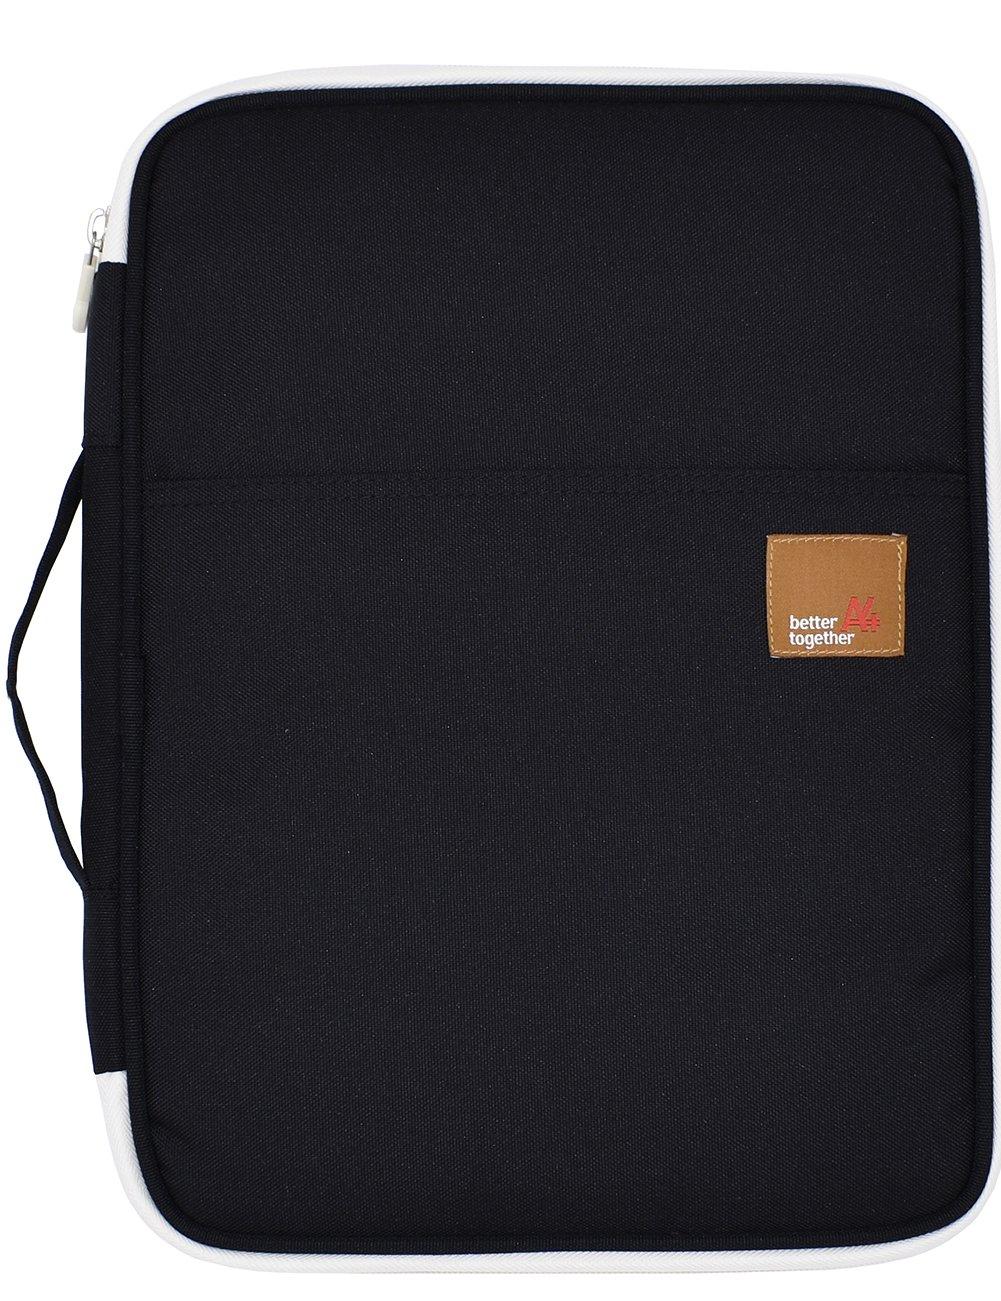 Mygreen Universal Travel Gear Organizer / Electronics Accessories Bag / Document File Bag (Large, Black)